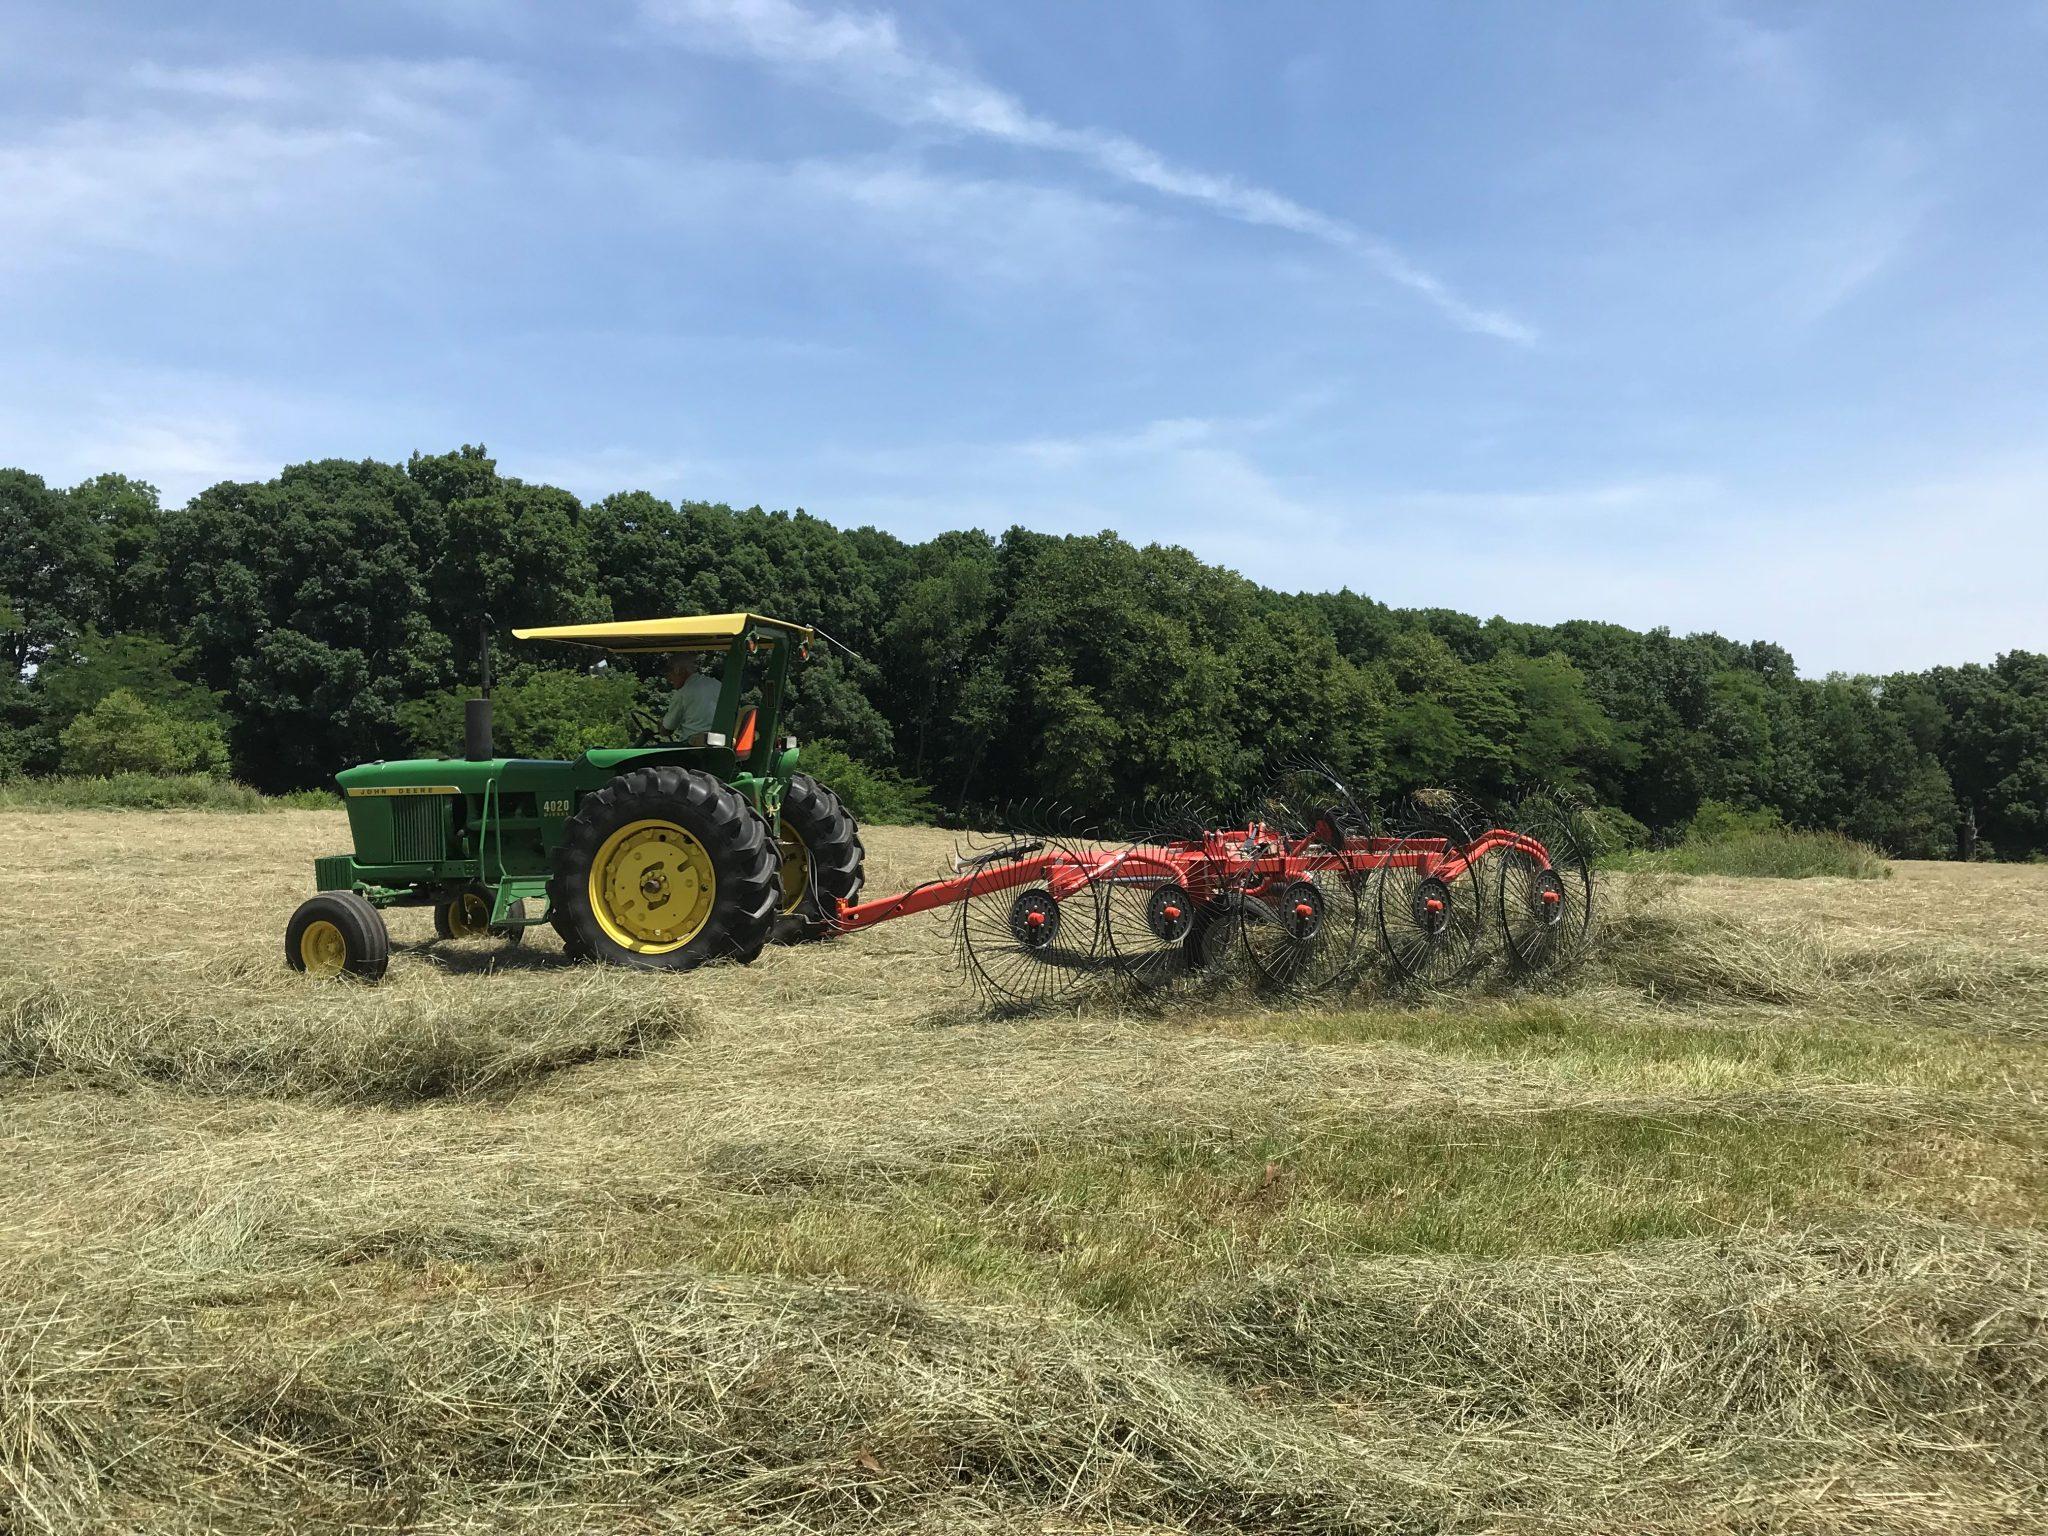 Raking hay into a windrow before baling occurs. (Photo Credit: Keith Johnson)